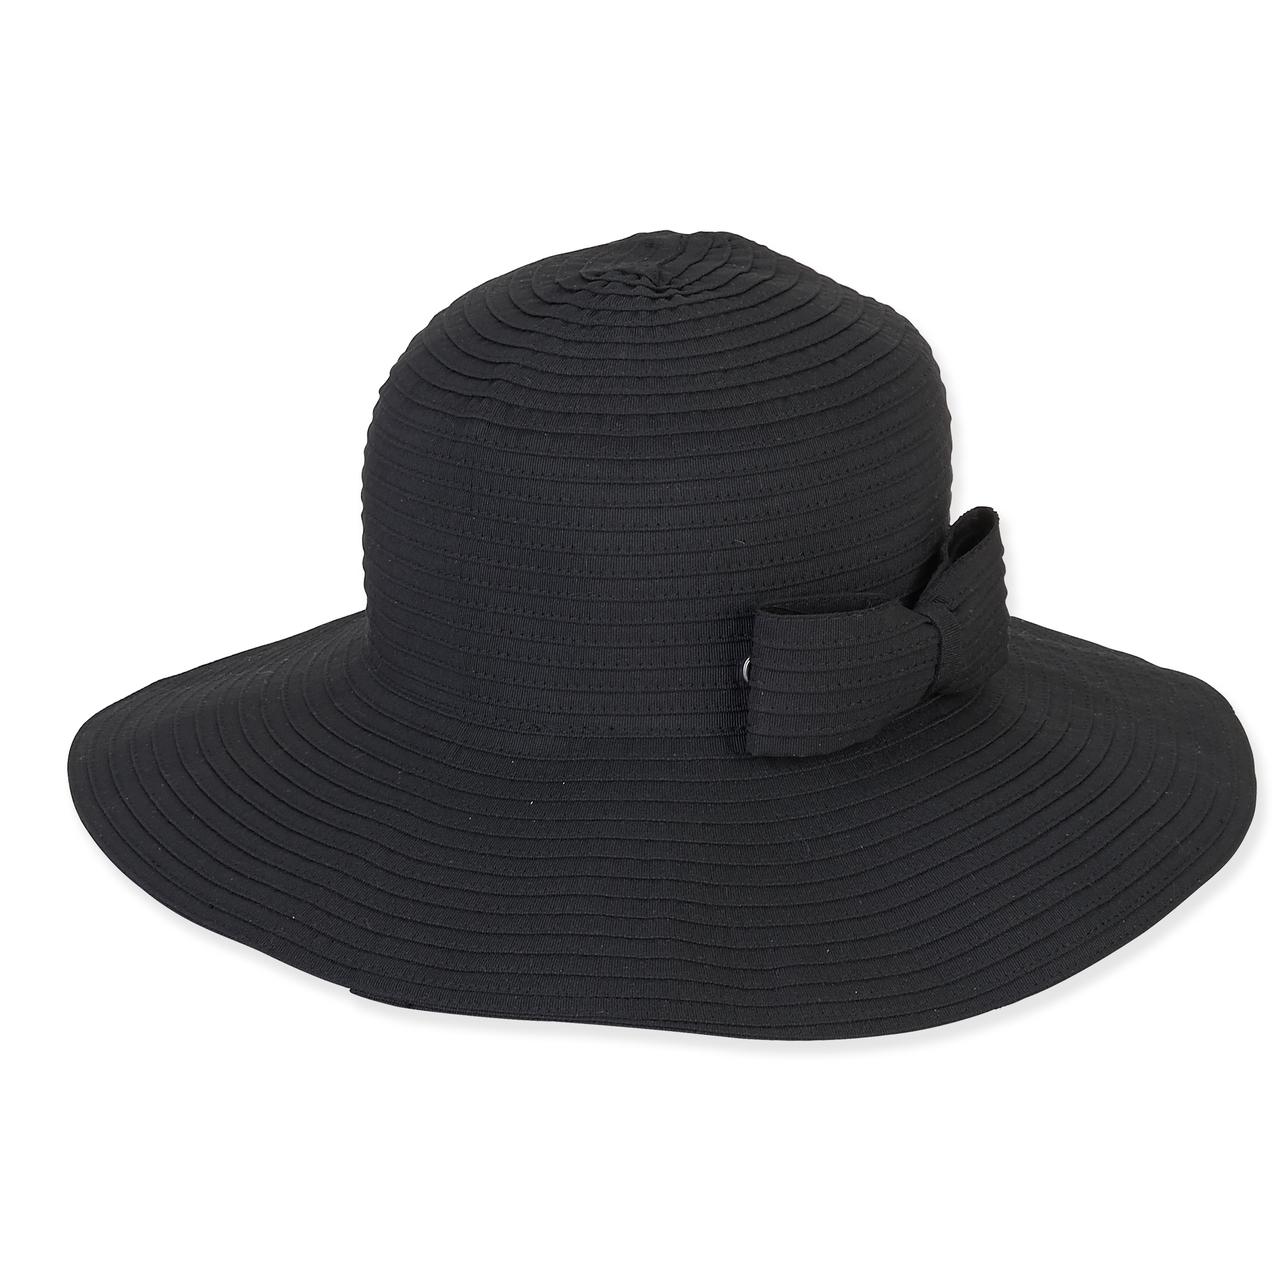 b90040fb FOLDABLE HAT W/BOW TRIM - Sun 'N' Sand Accessories